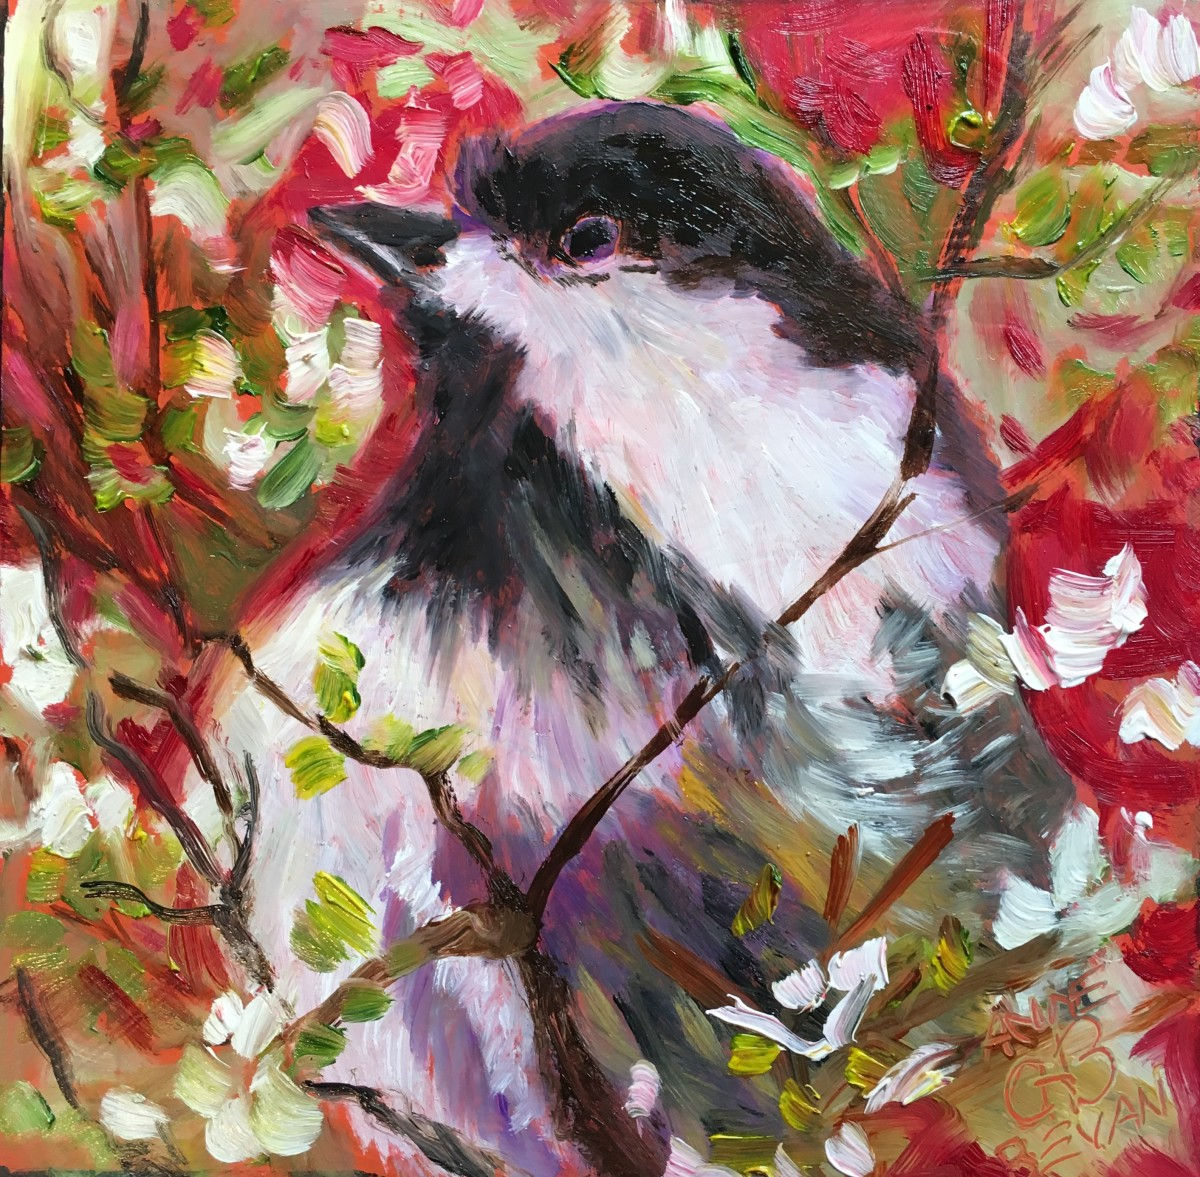 Chickadee in the Cherry Tree